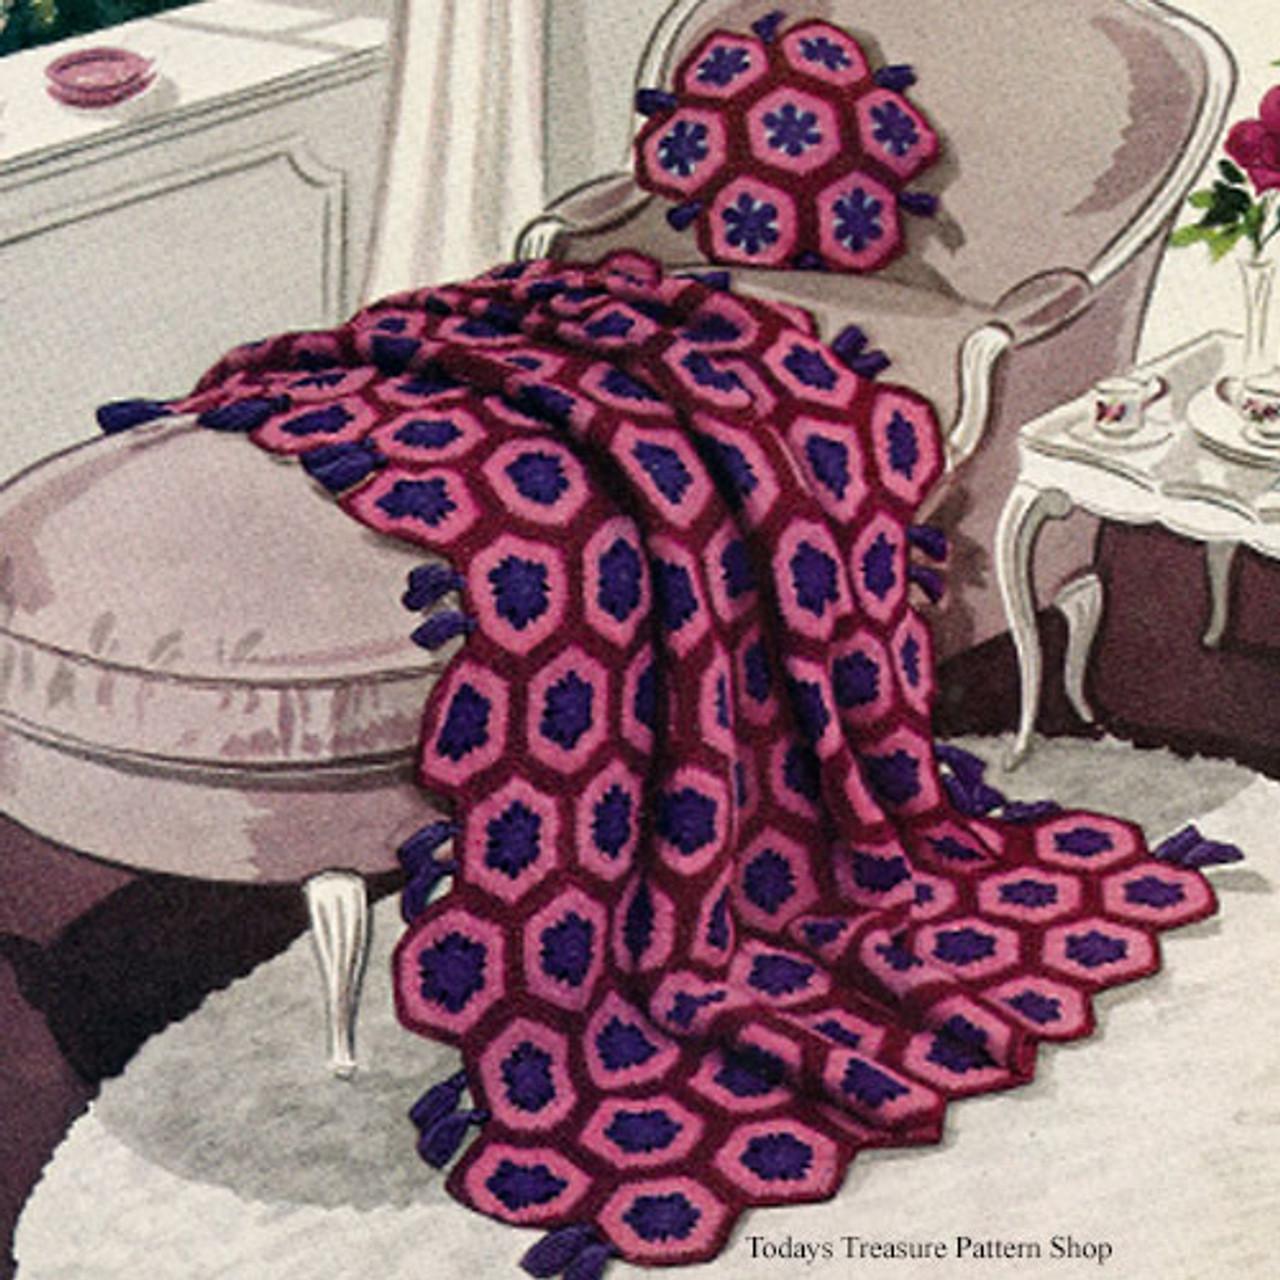 Crochet Hexagon Block Afghan Pattern, Vintage 1940s